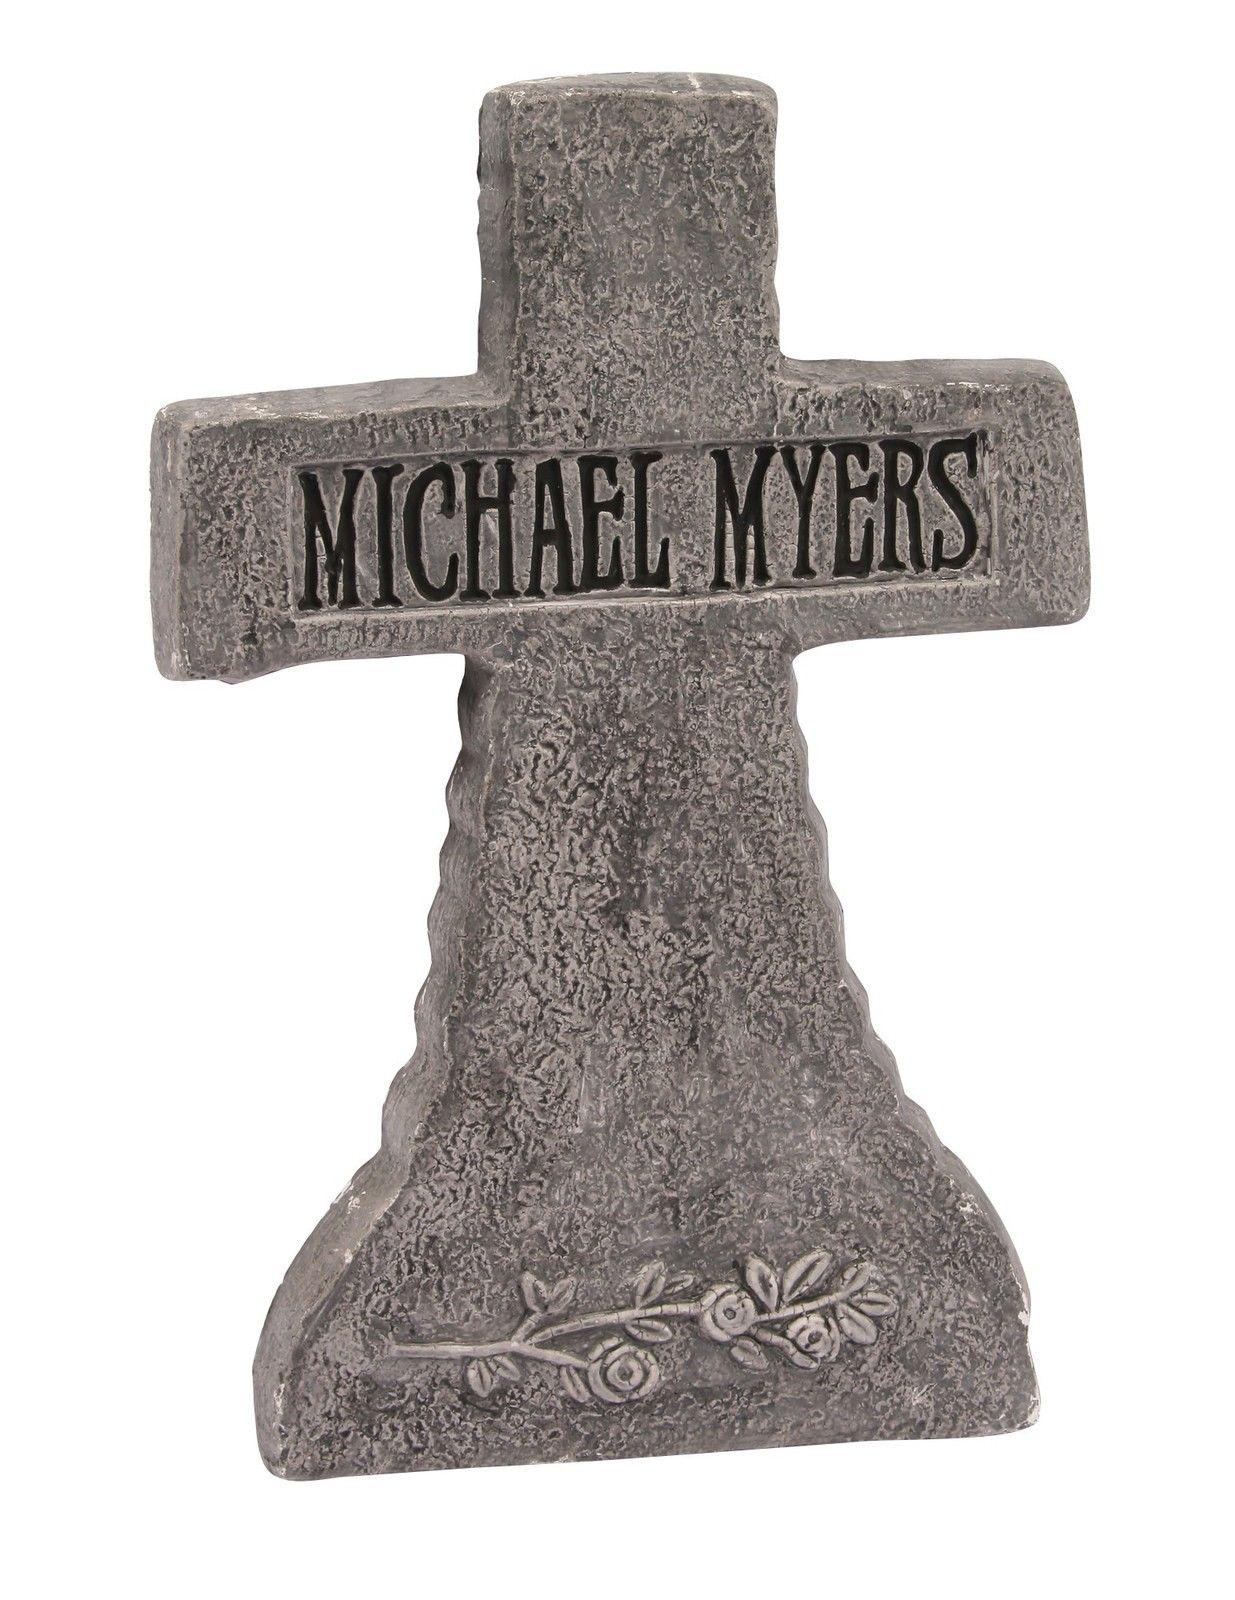 21 cross michael myers halloween tombstone gravestone halloween decoration prop - Michael Myers Halloween Decorations